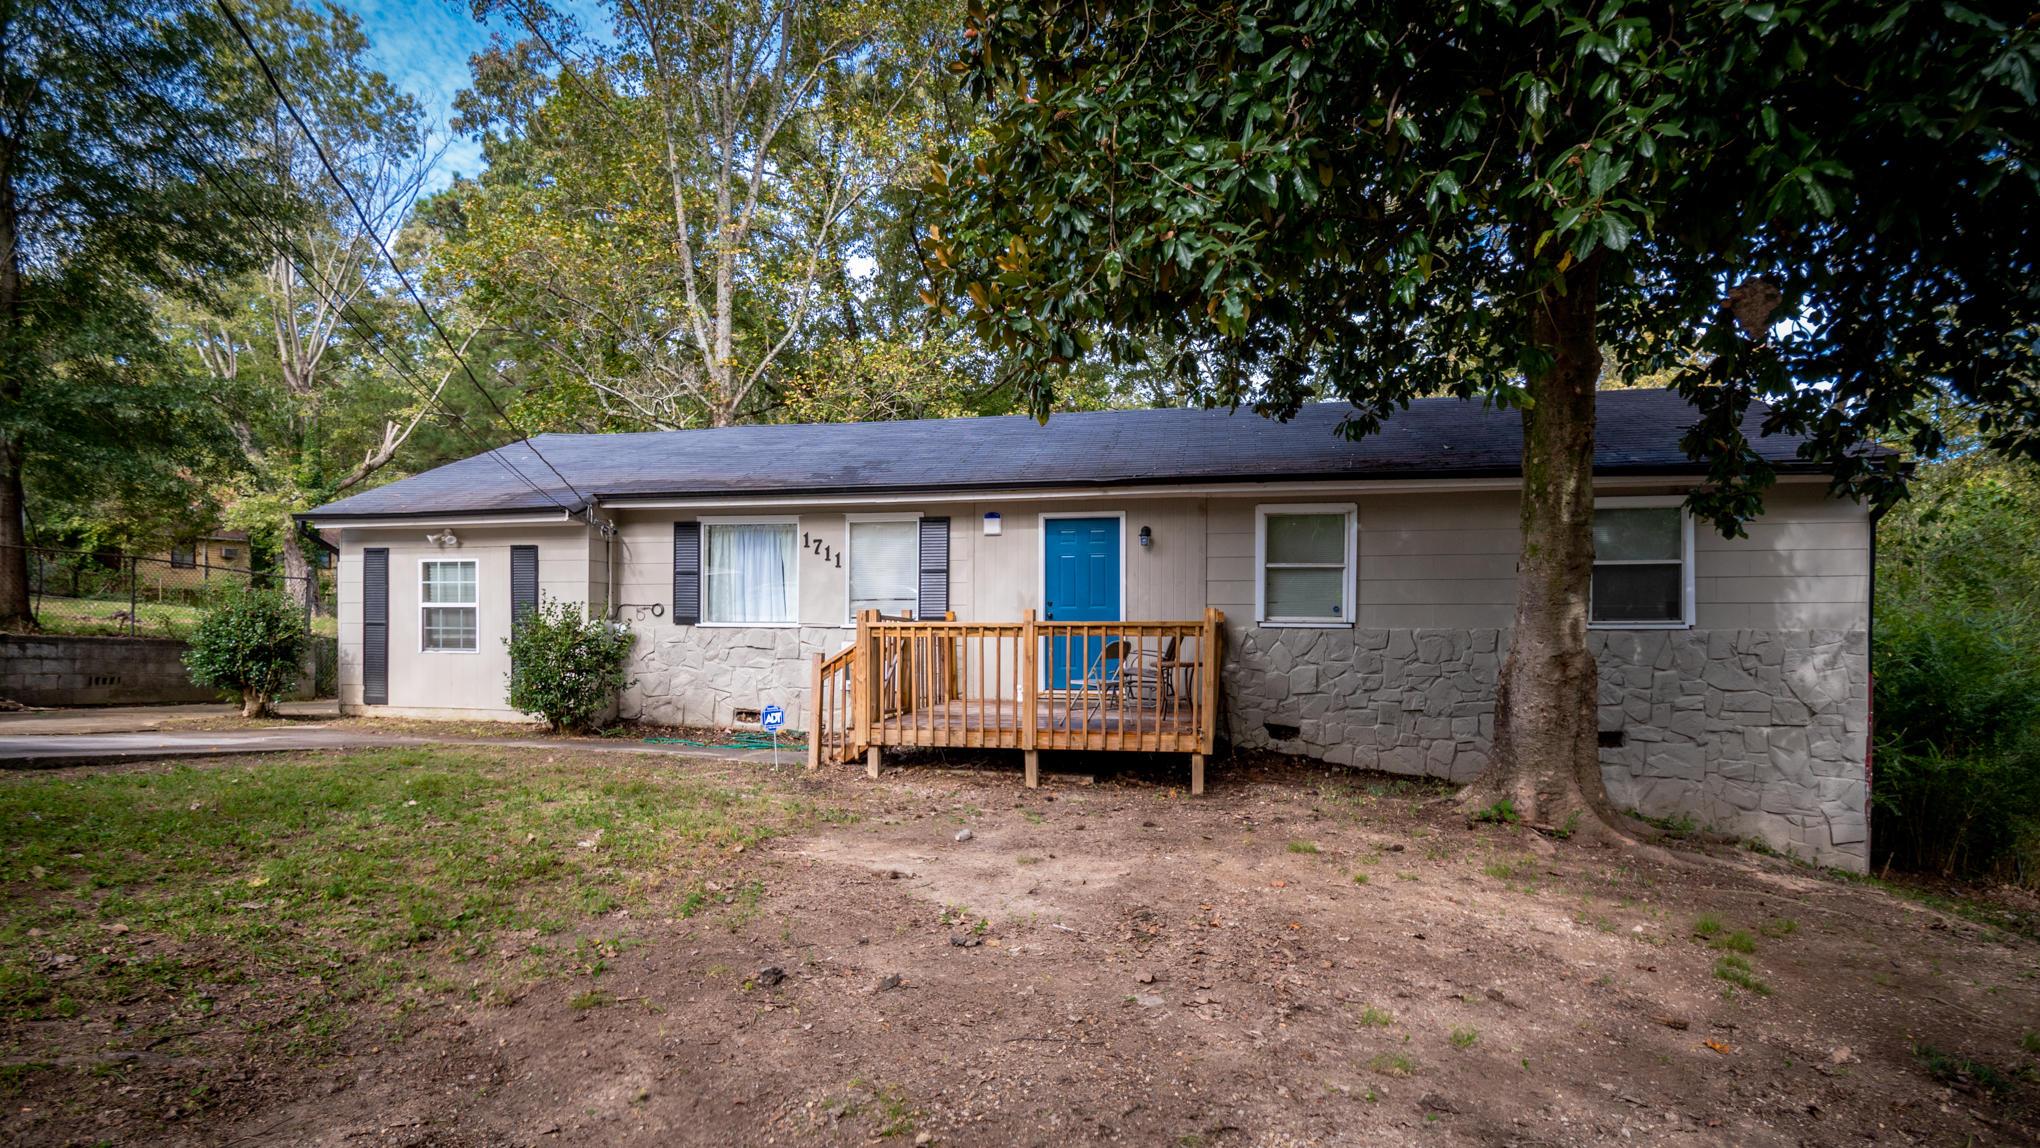 1711 La Hugh St, Chattanooga, TN 37406